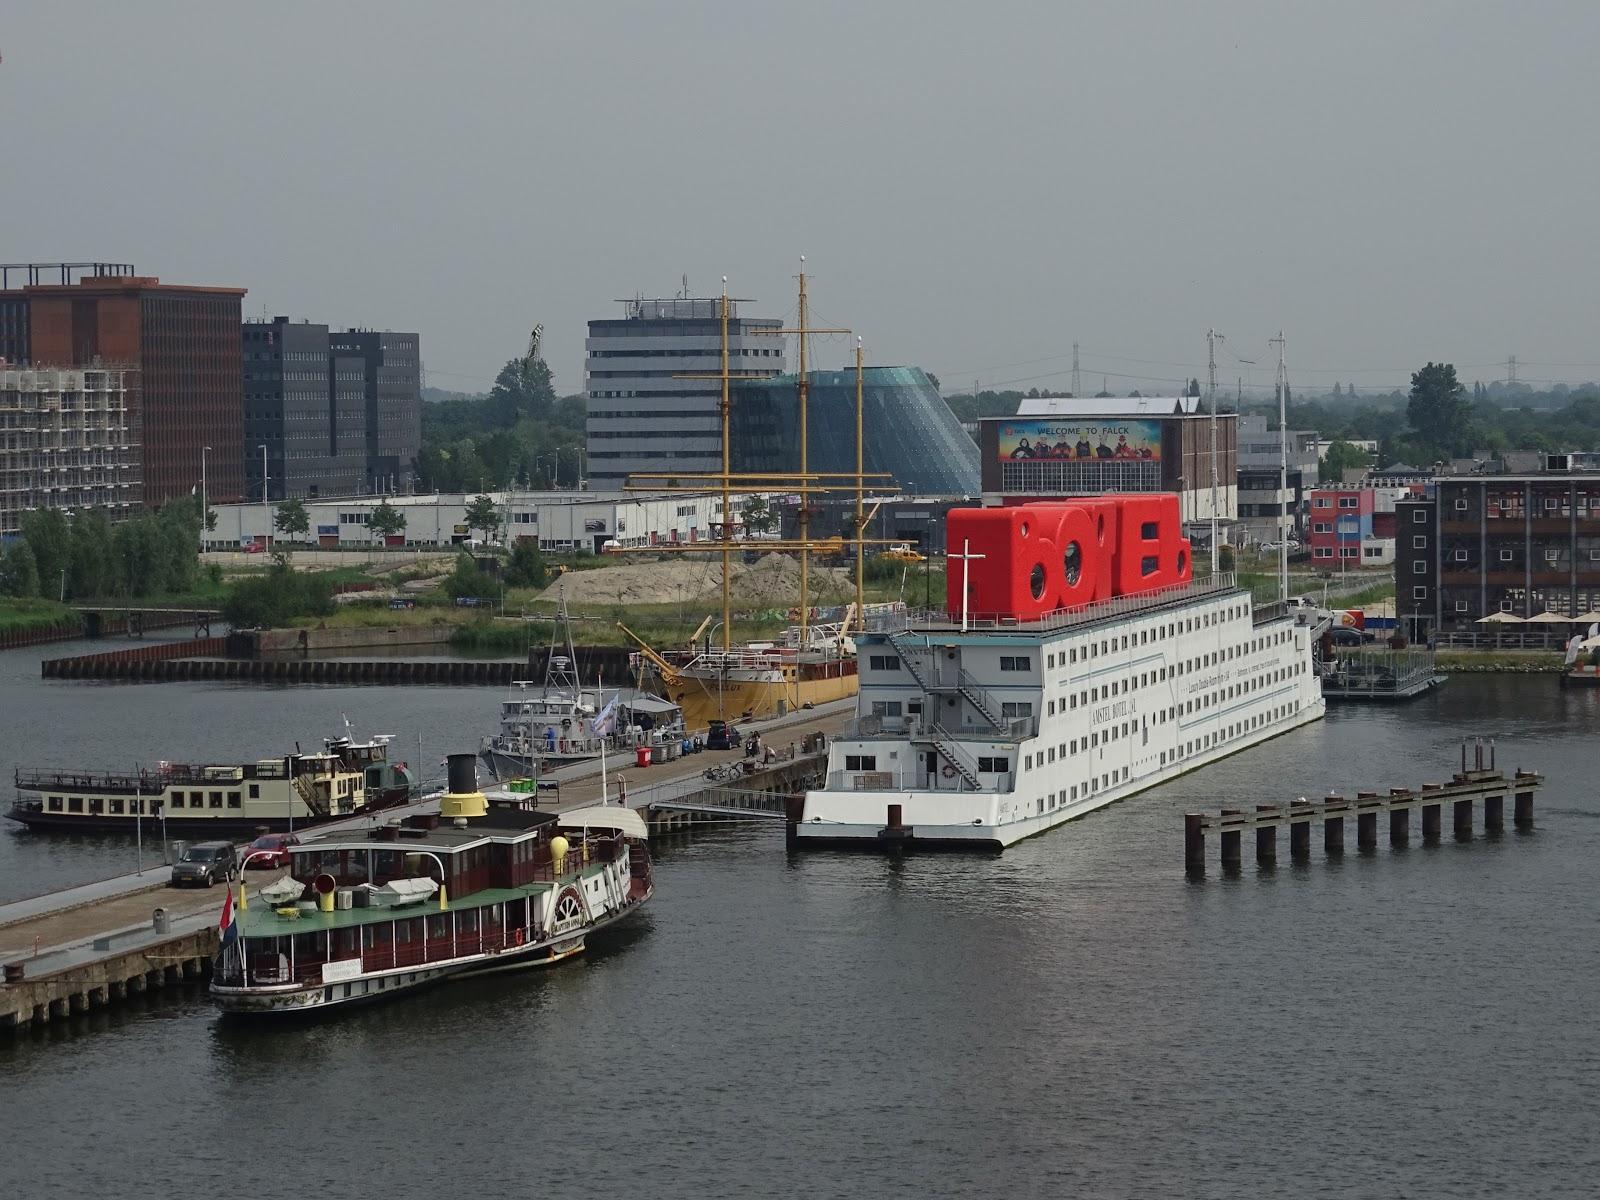 Sergio cruises navio hotel amstel botel em amesterd o for Design hotel sauerland am kurhaus 6 8